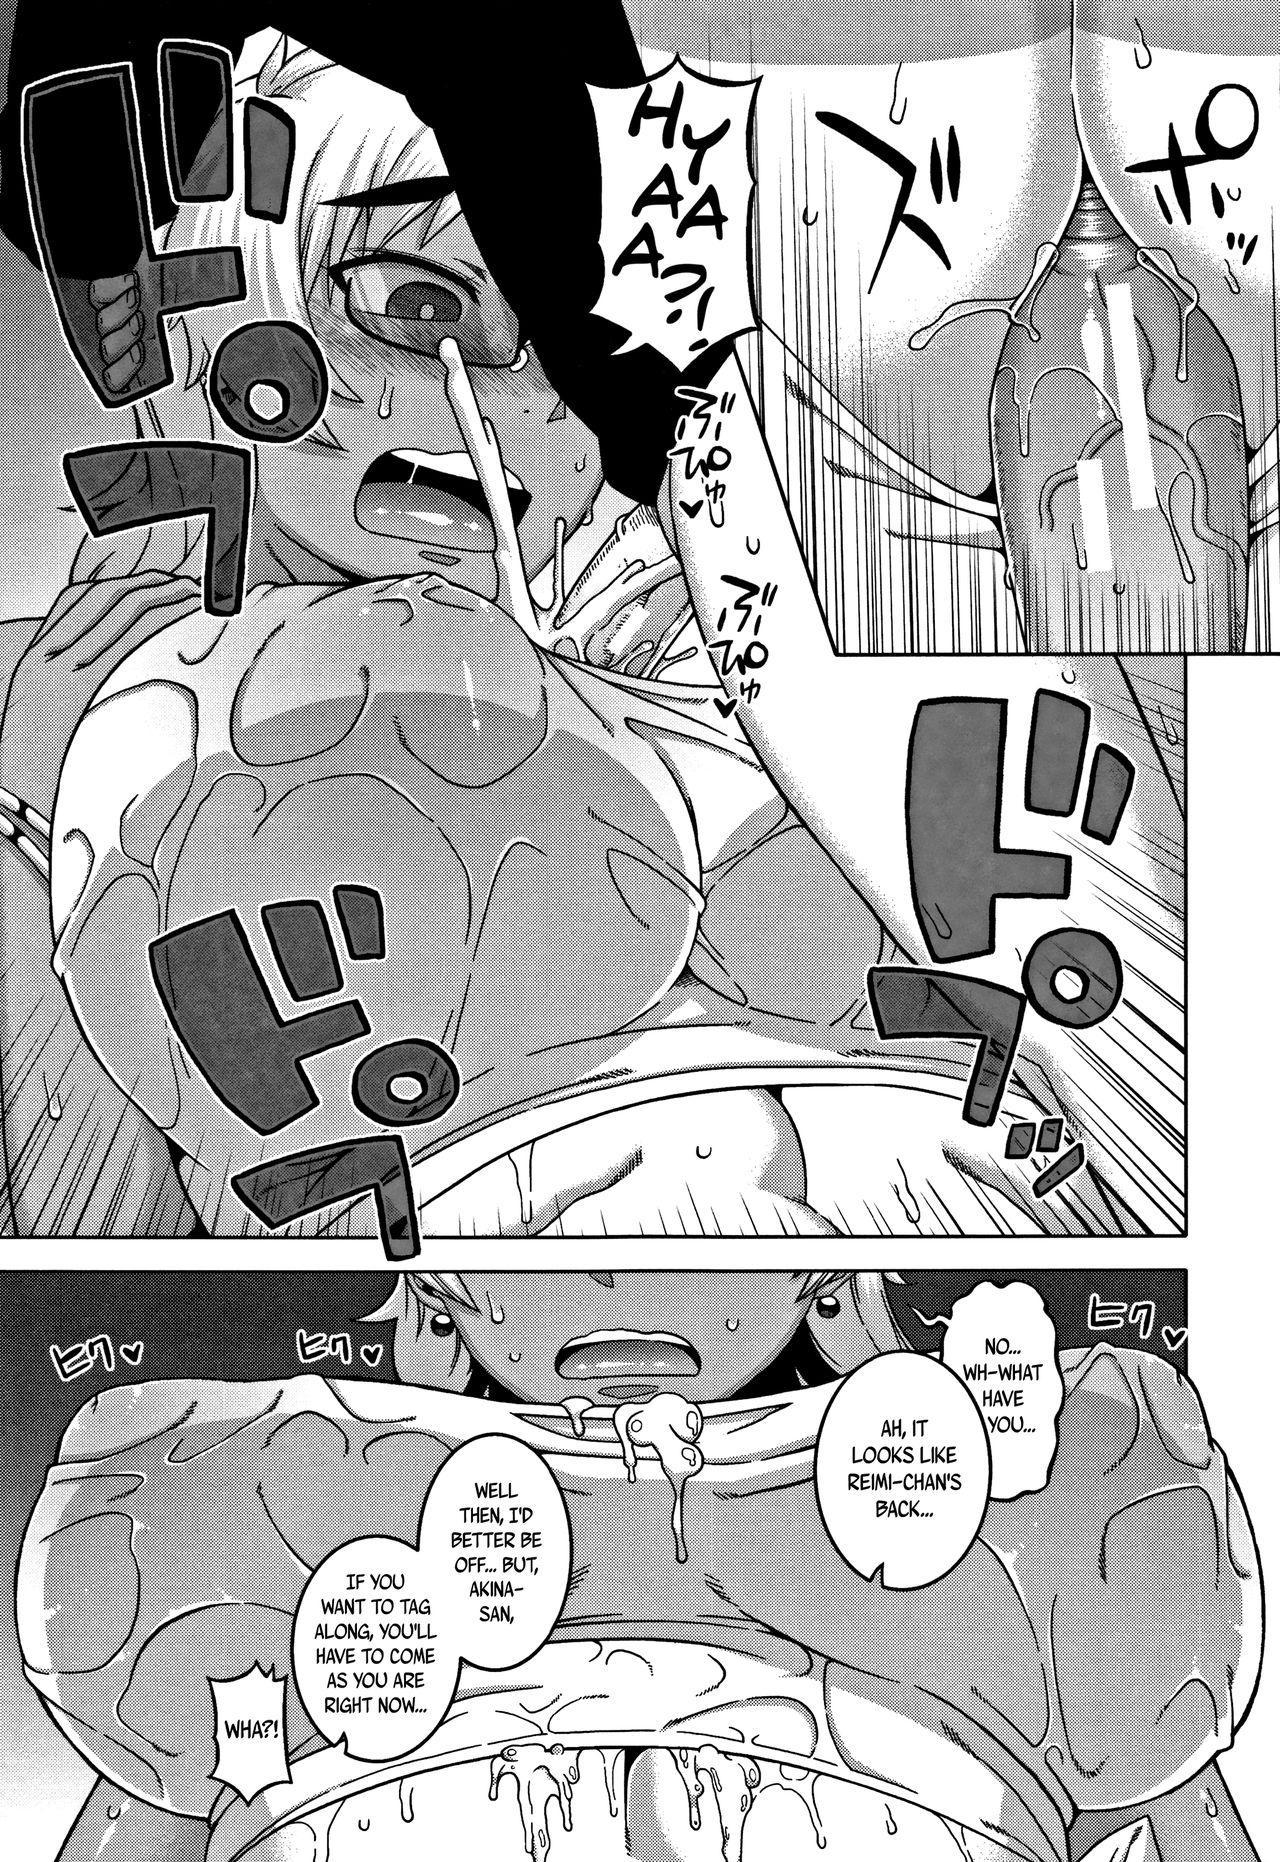 [Takatsu] Hitozuma A-san to Musuko no Yuujin N-kun - Married wife A and son's friend N-kun [English] 94